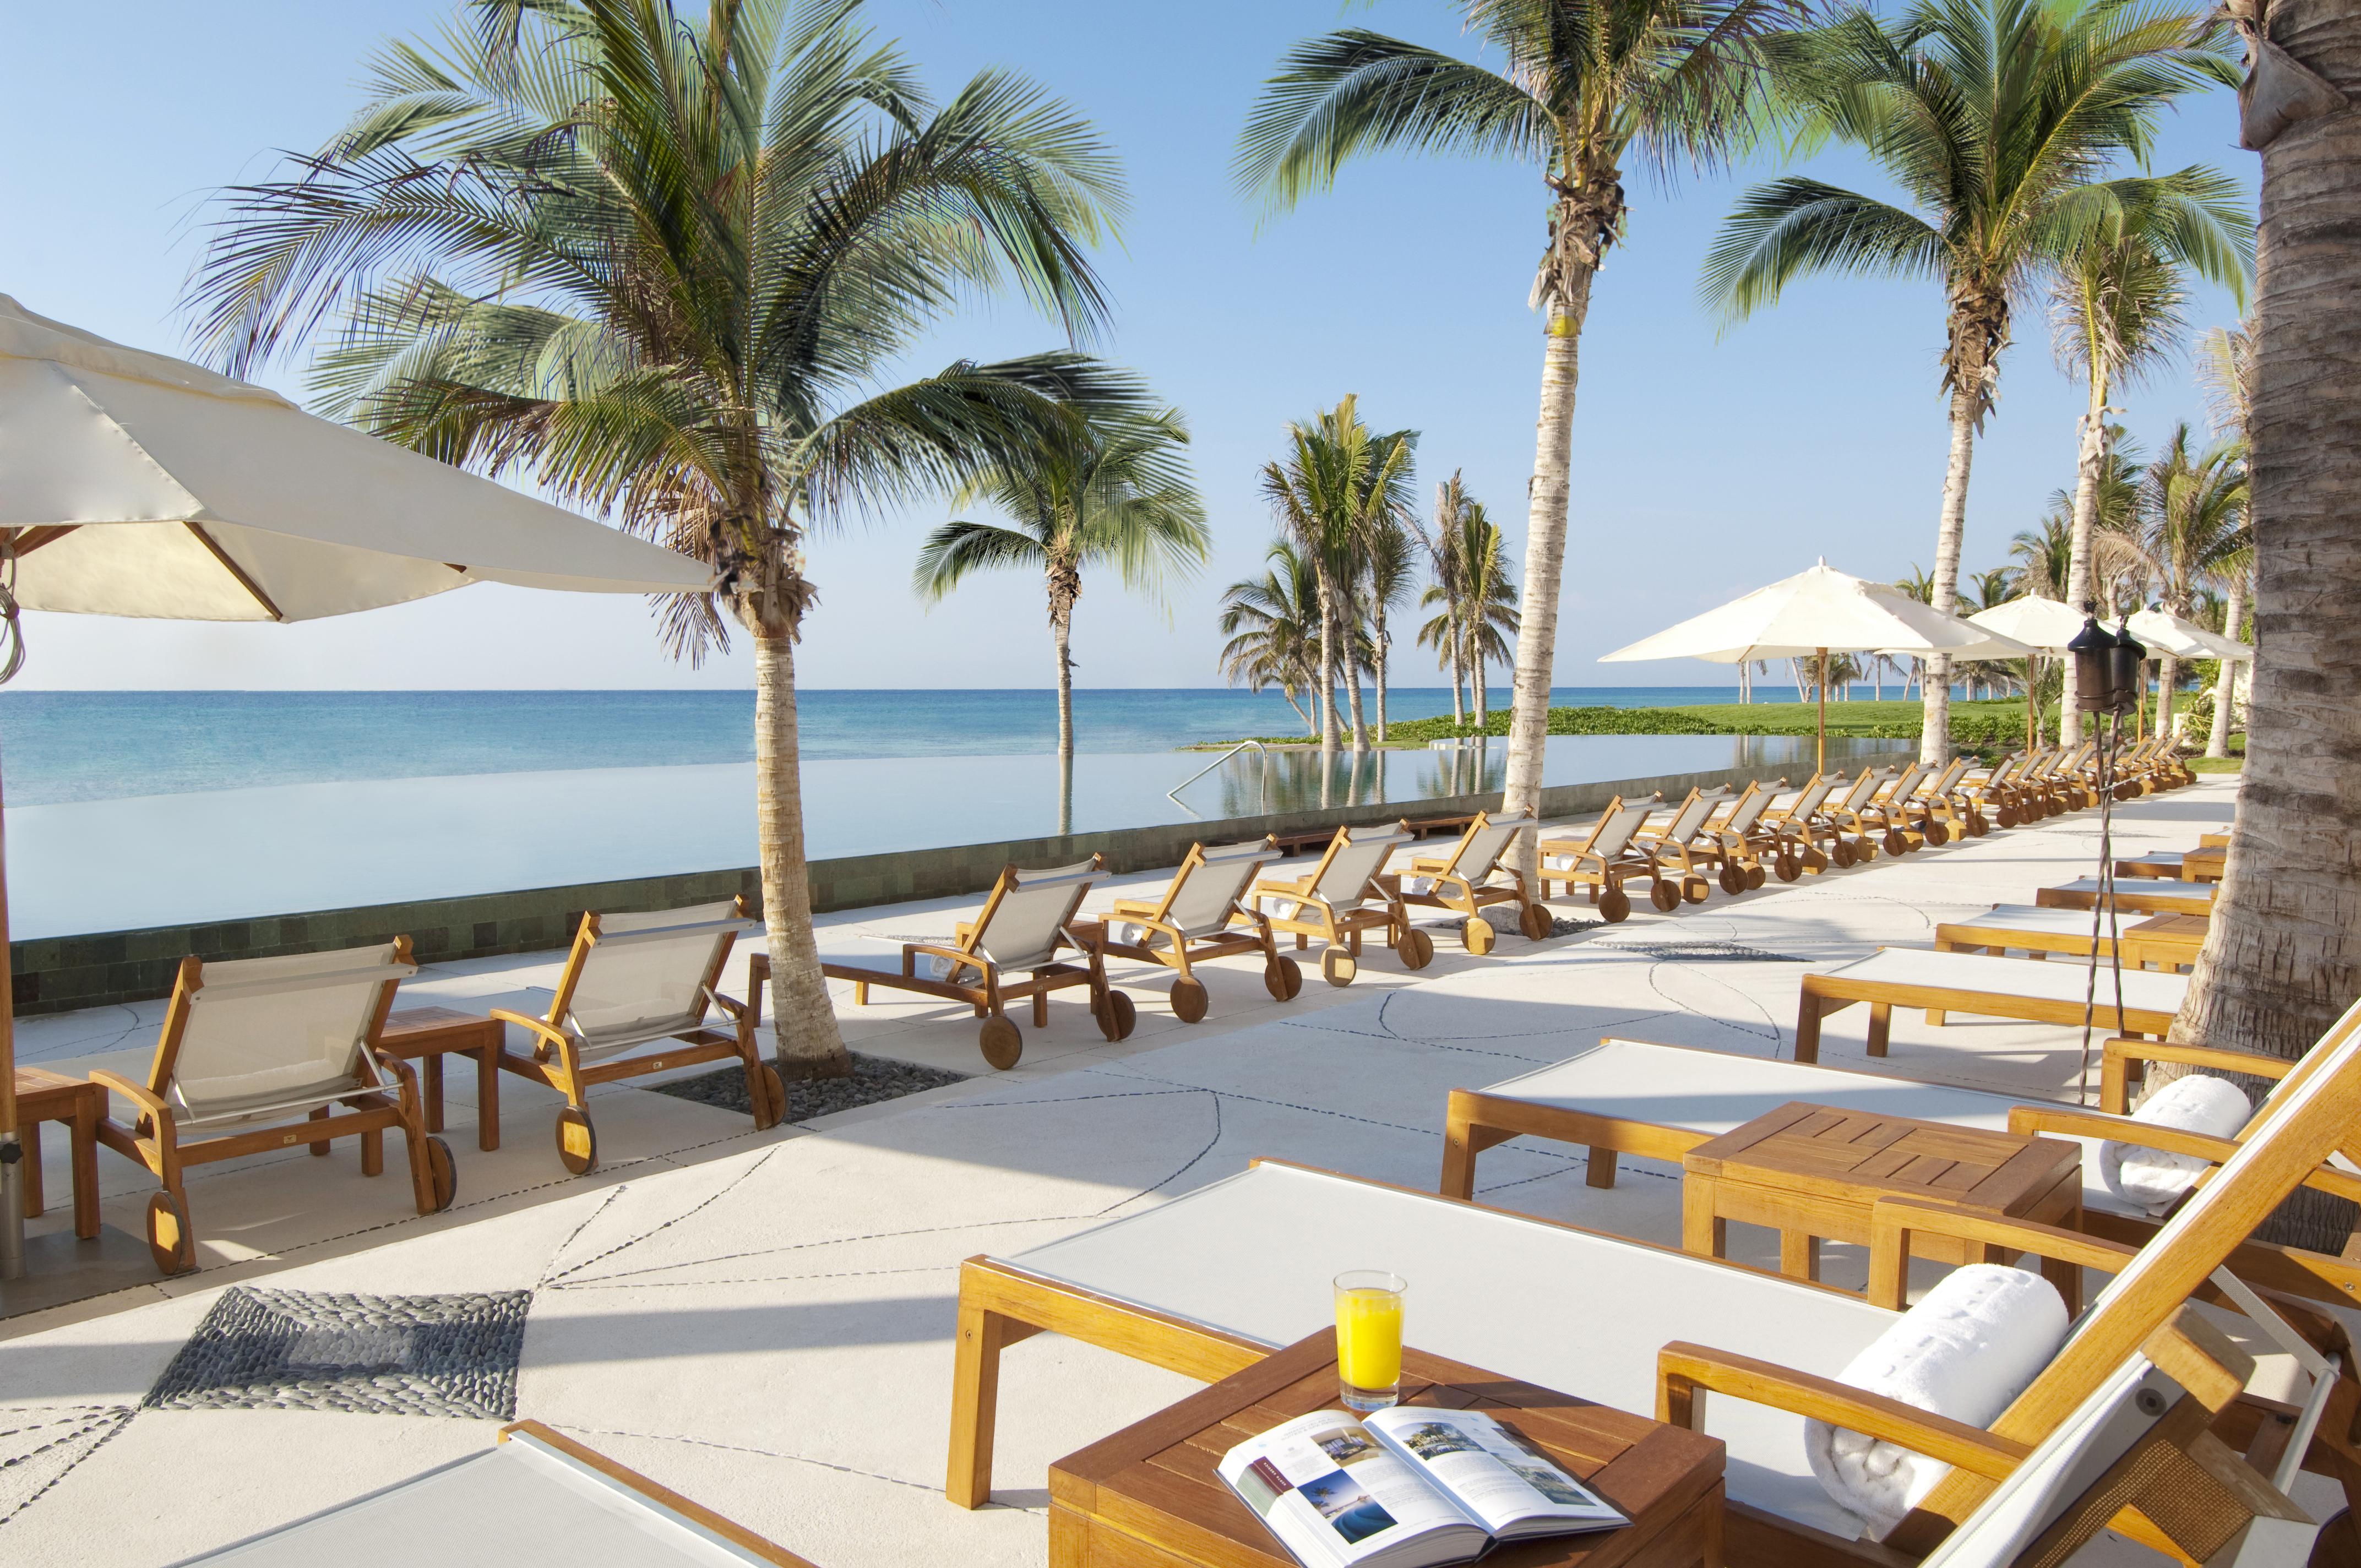 Travel Agency All-Inclusive Resort Grand Velas Riviera Maya 011